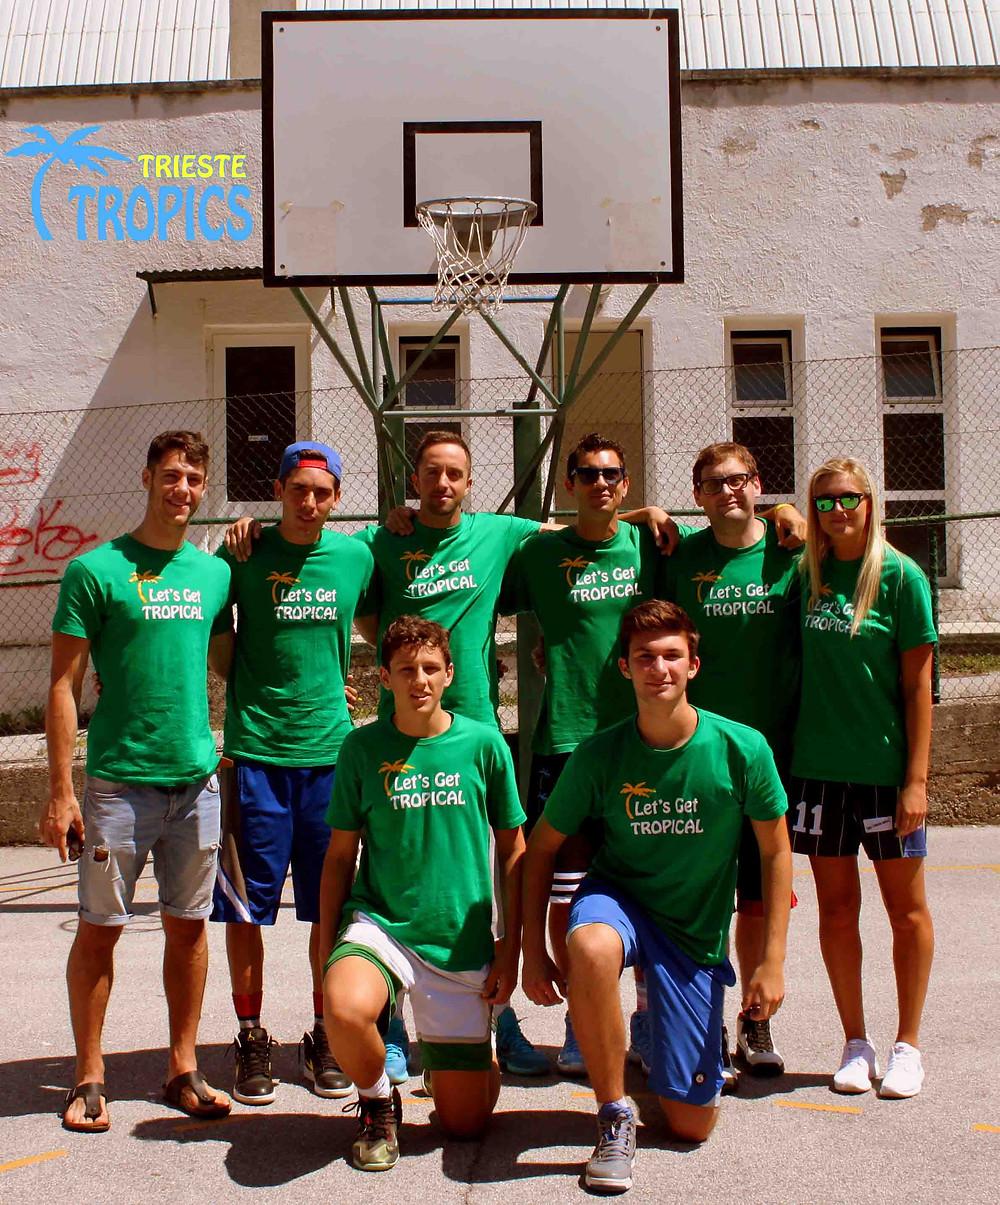 Istruttori Tropicali 2015